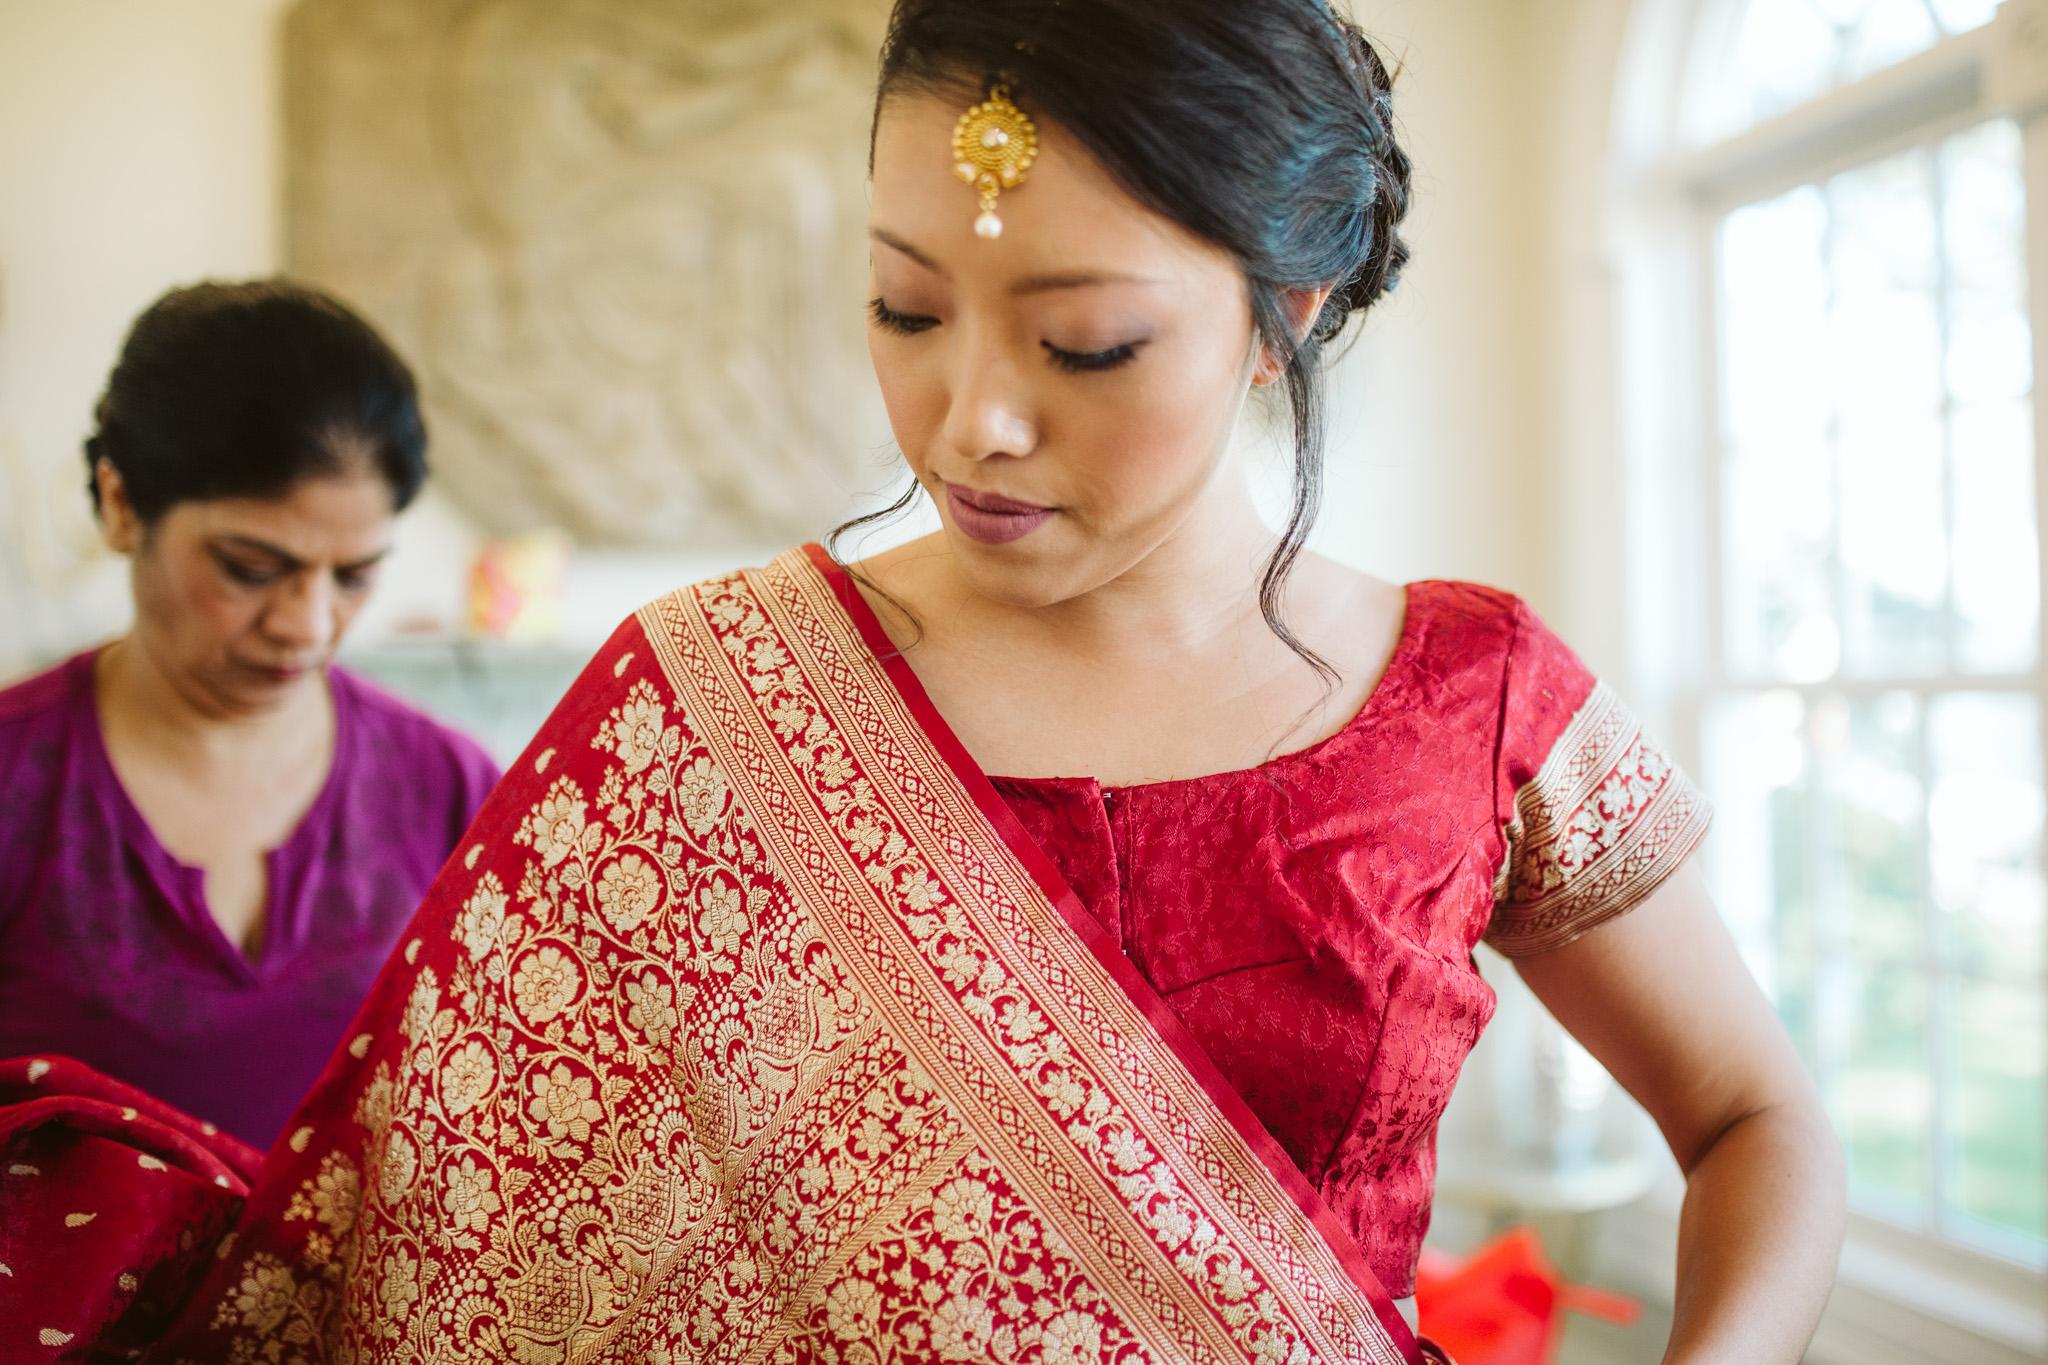 rebeccaburtphotography.hindiwedding.moraisvineyards.virginiawedding-19.JPG